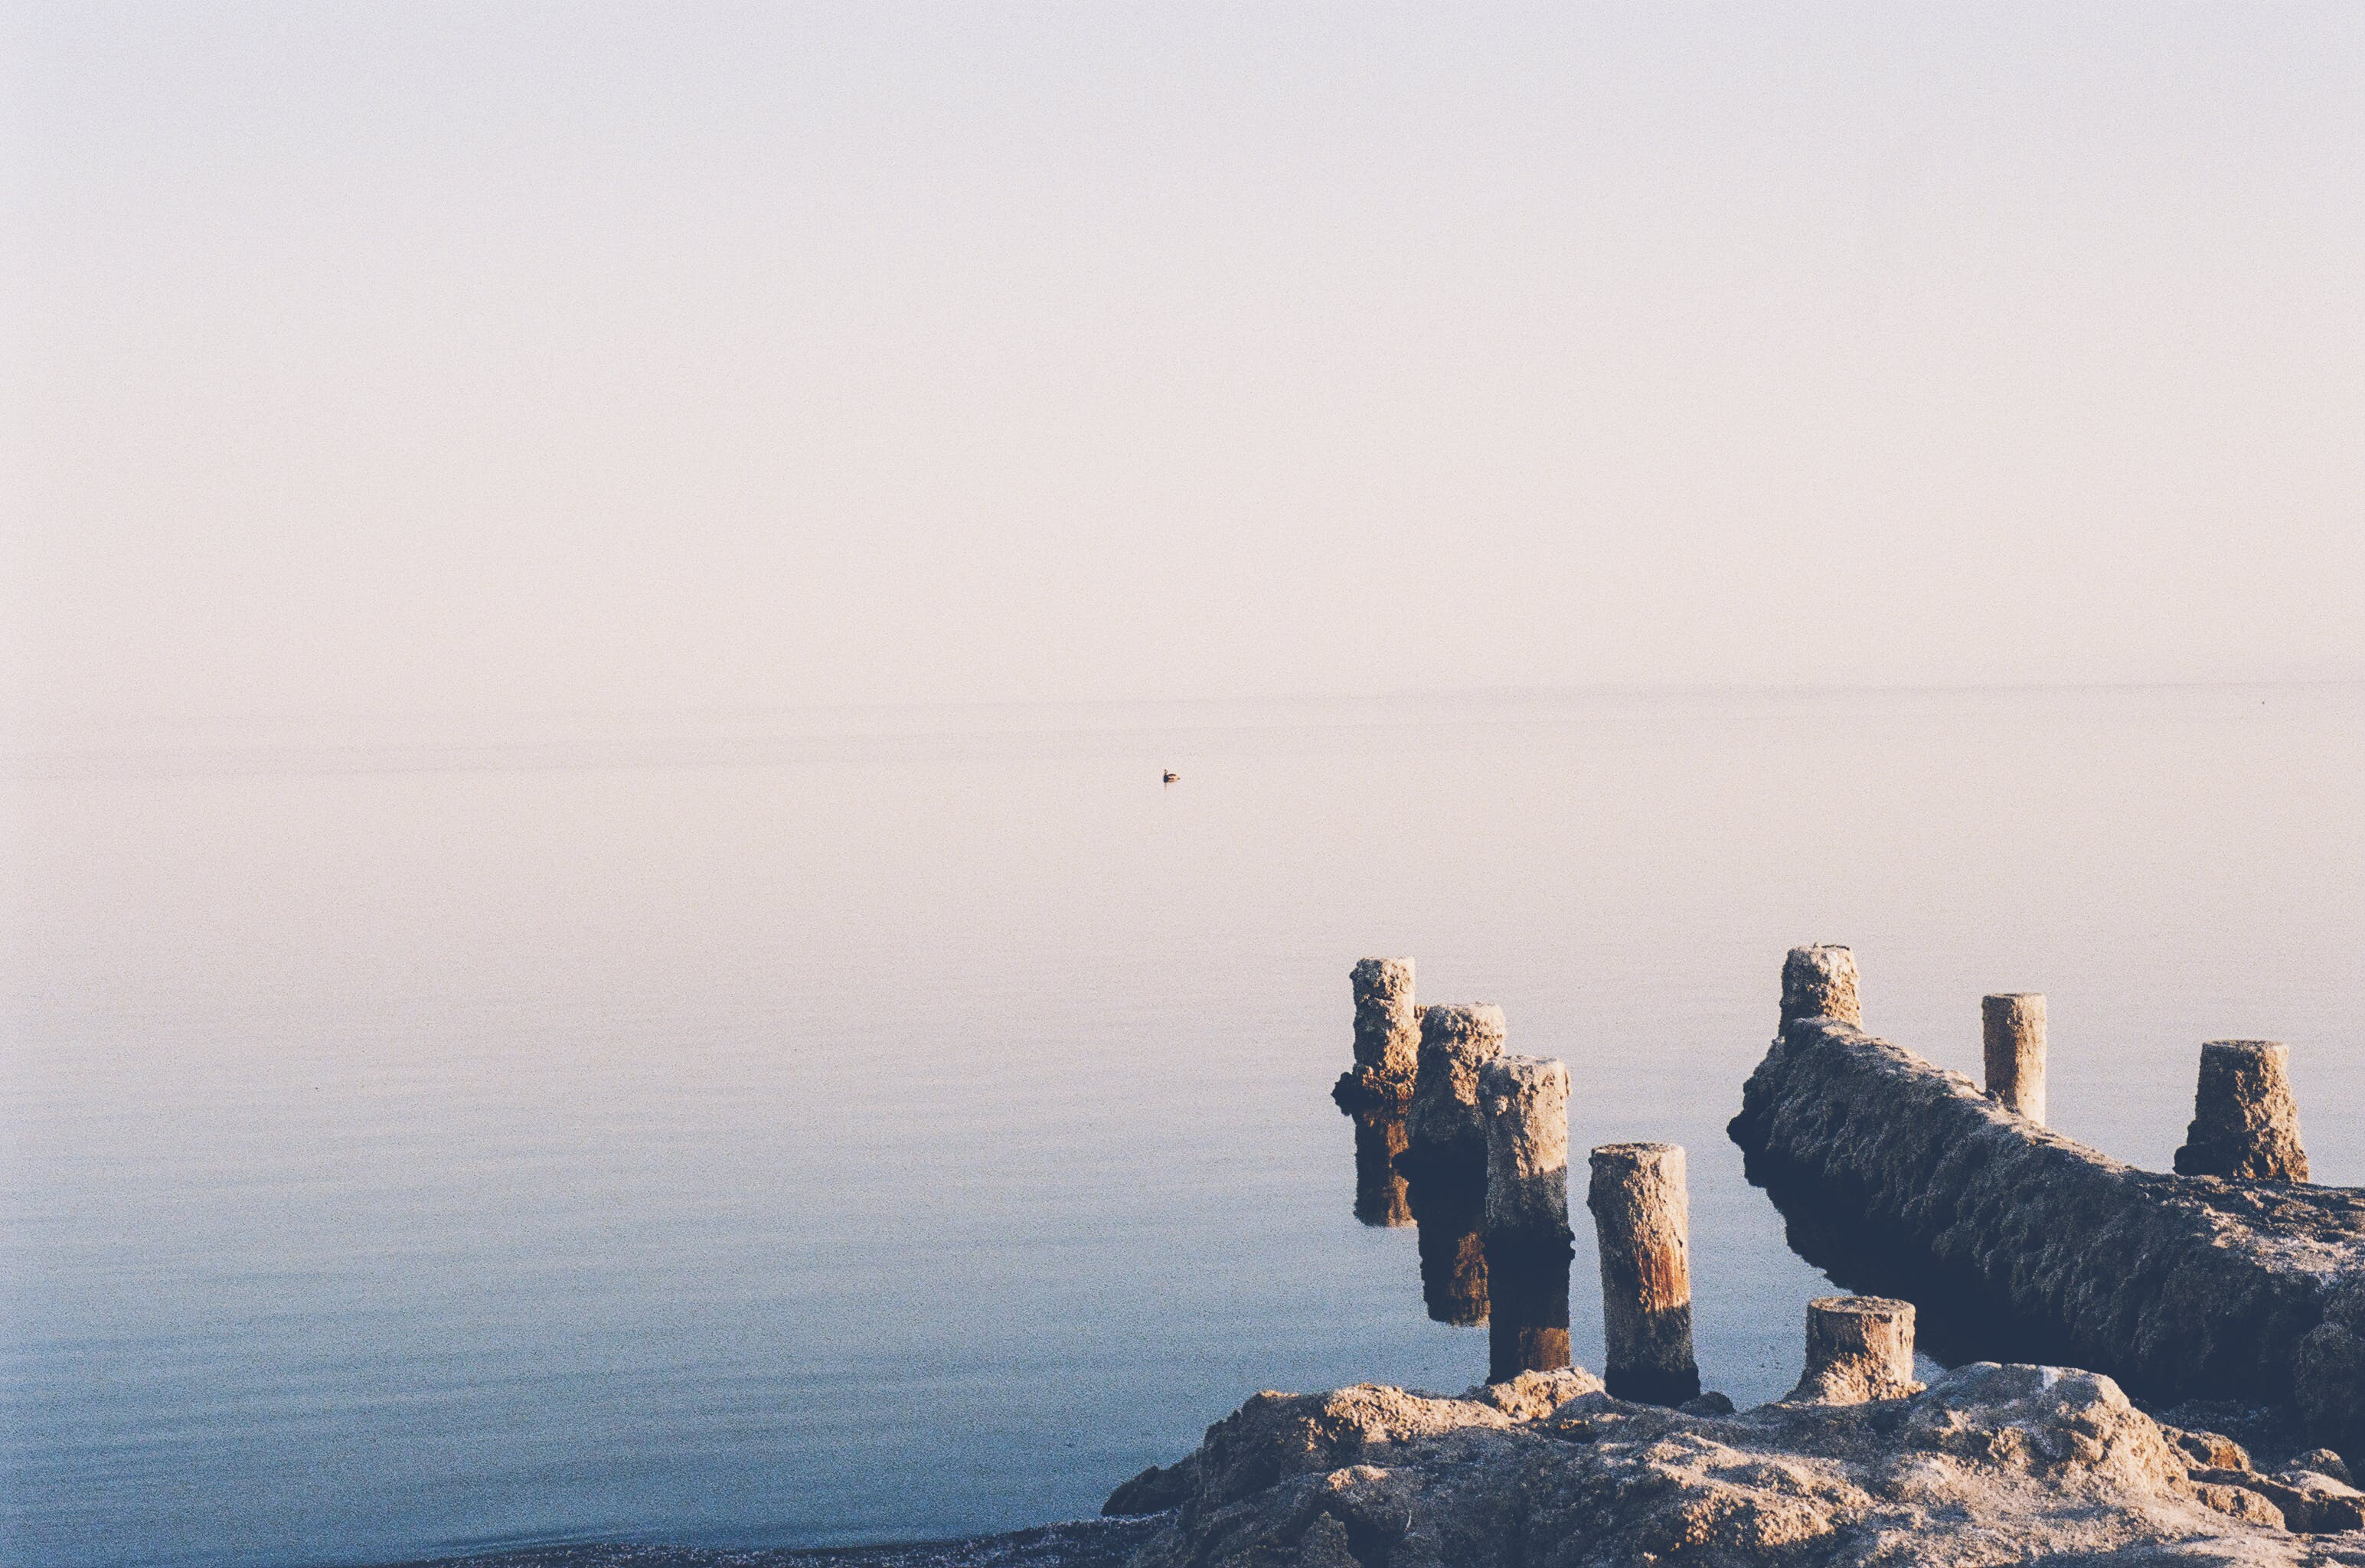 Sea Near Rocks